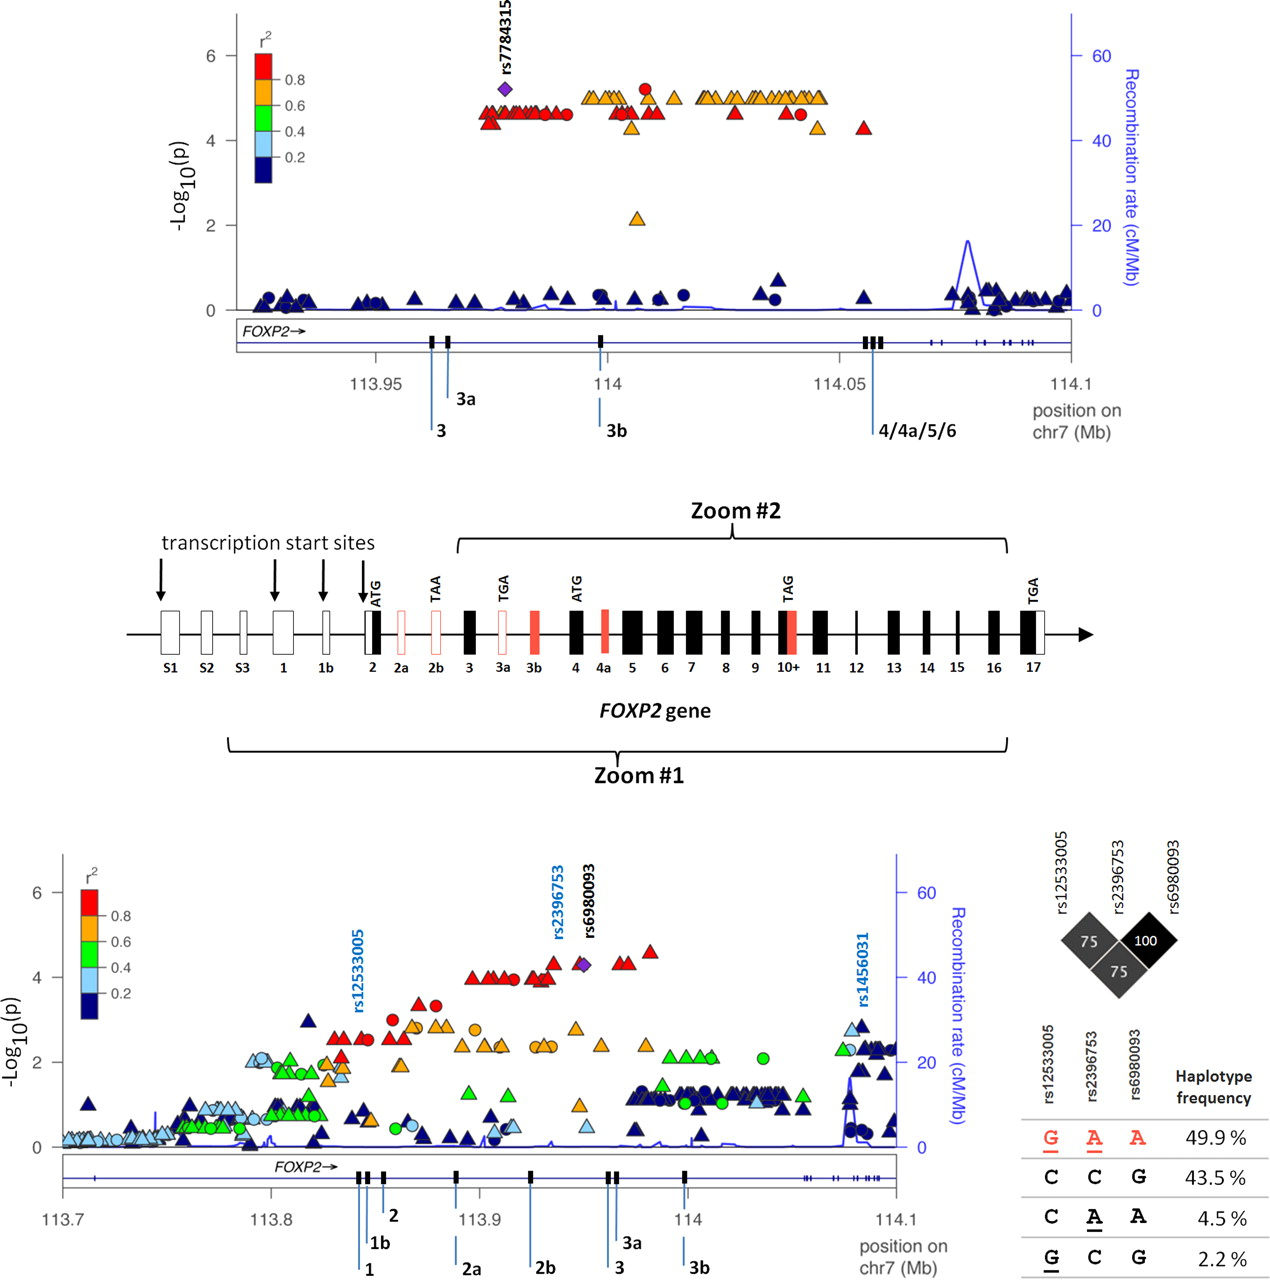 Genetic Variants of FOXP2 and KIAA0319/TTRAP/THEM2 Locus Are